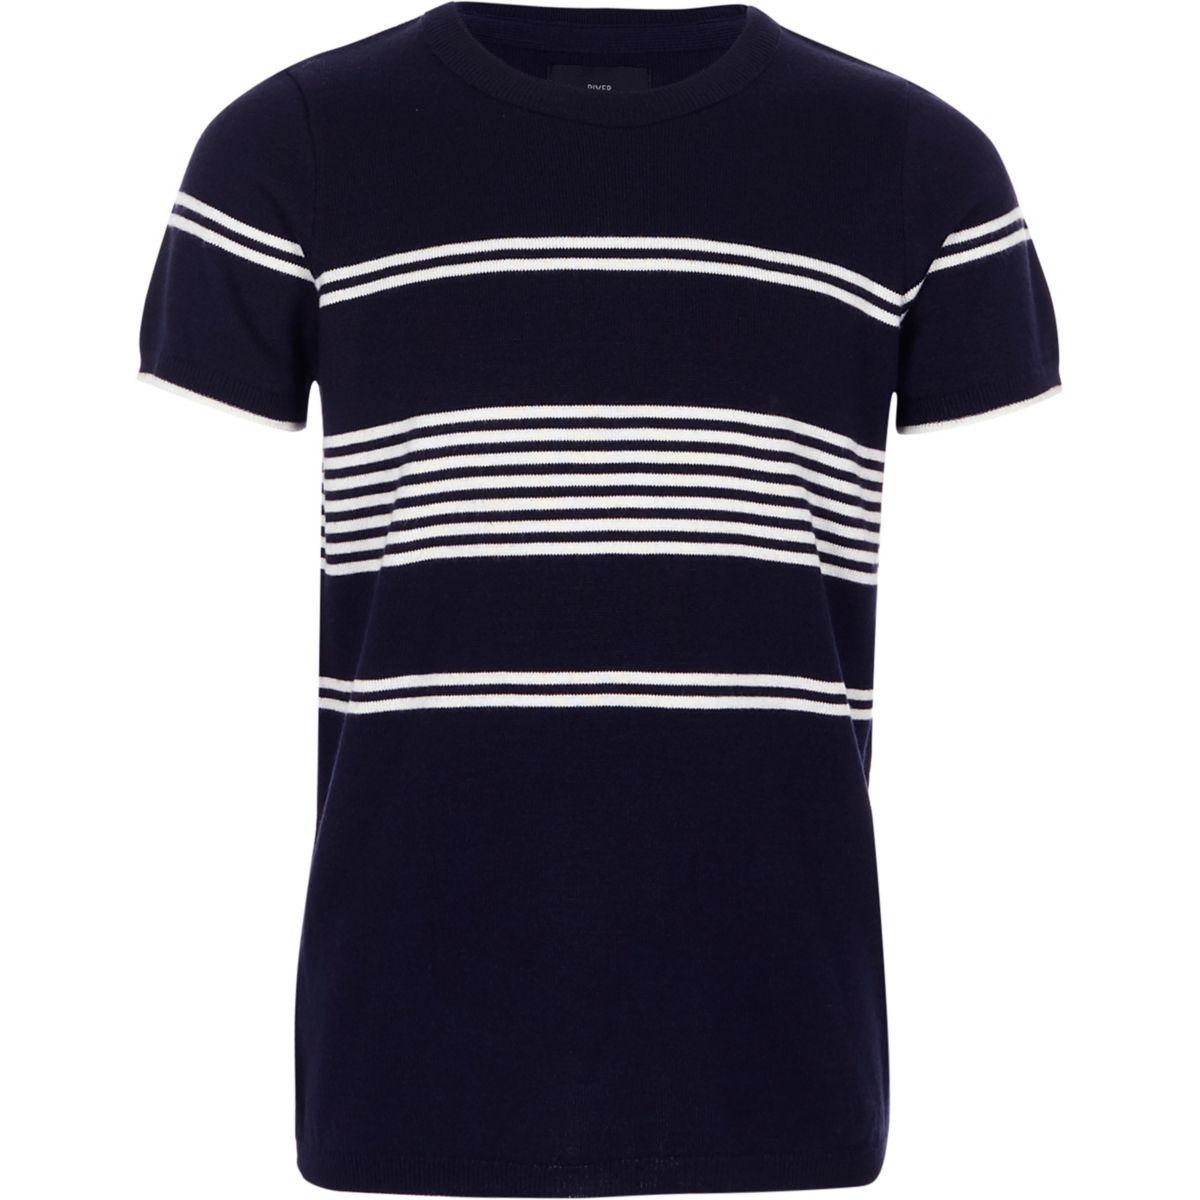 Boys navy stripe knitted T-shirt